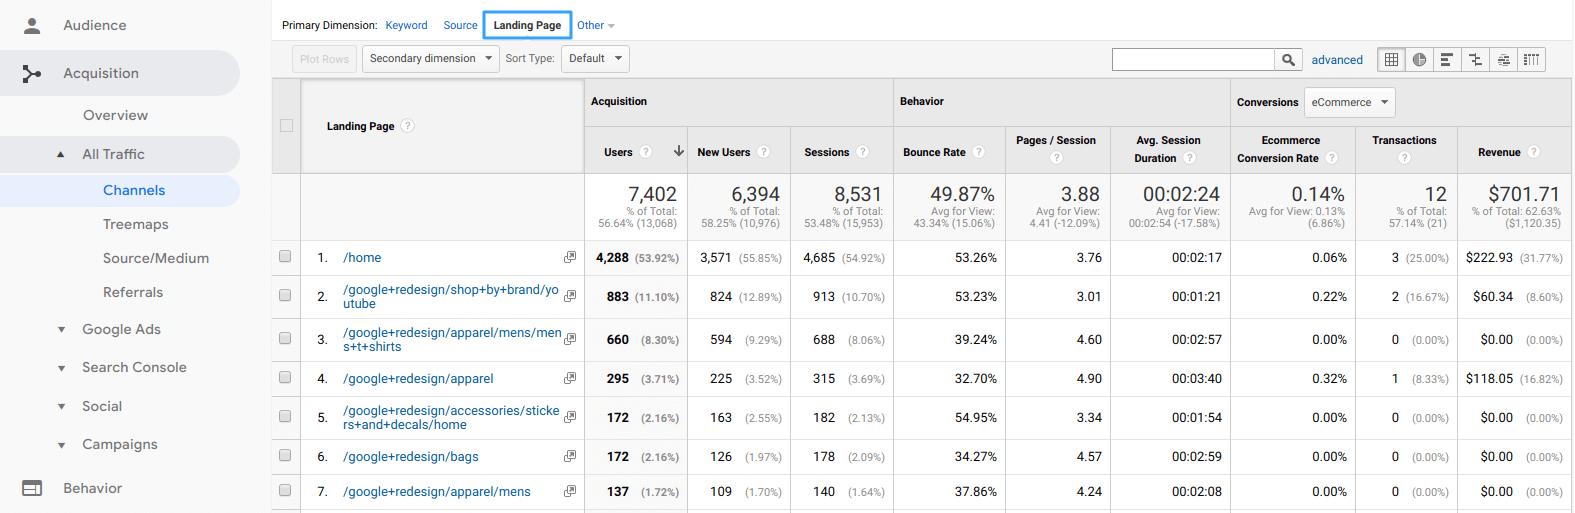 Landing page report in Google Analytics